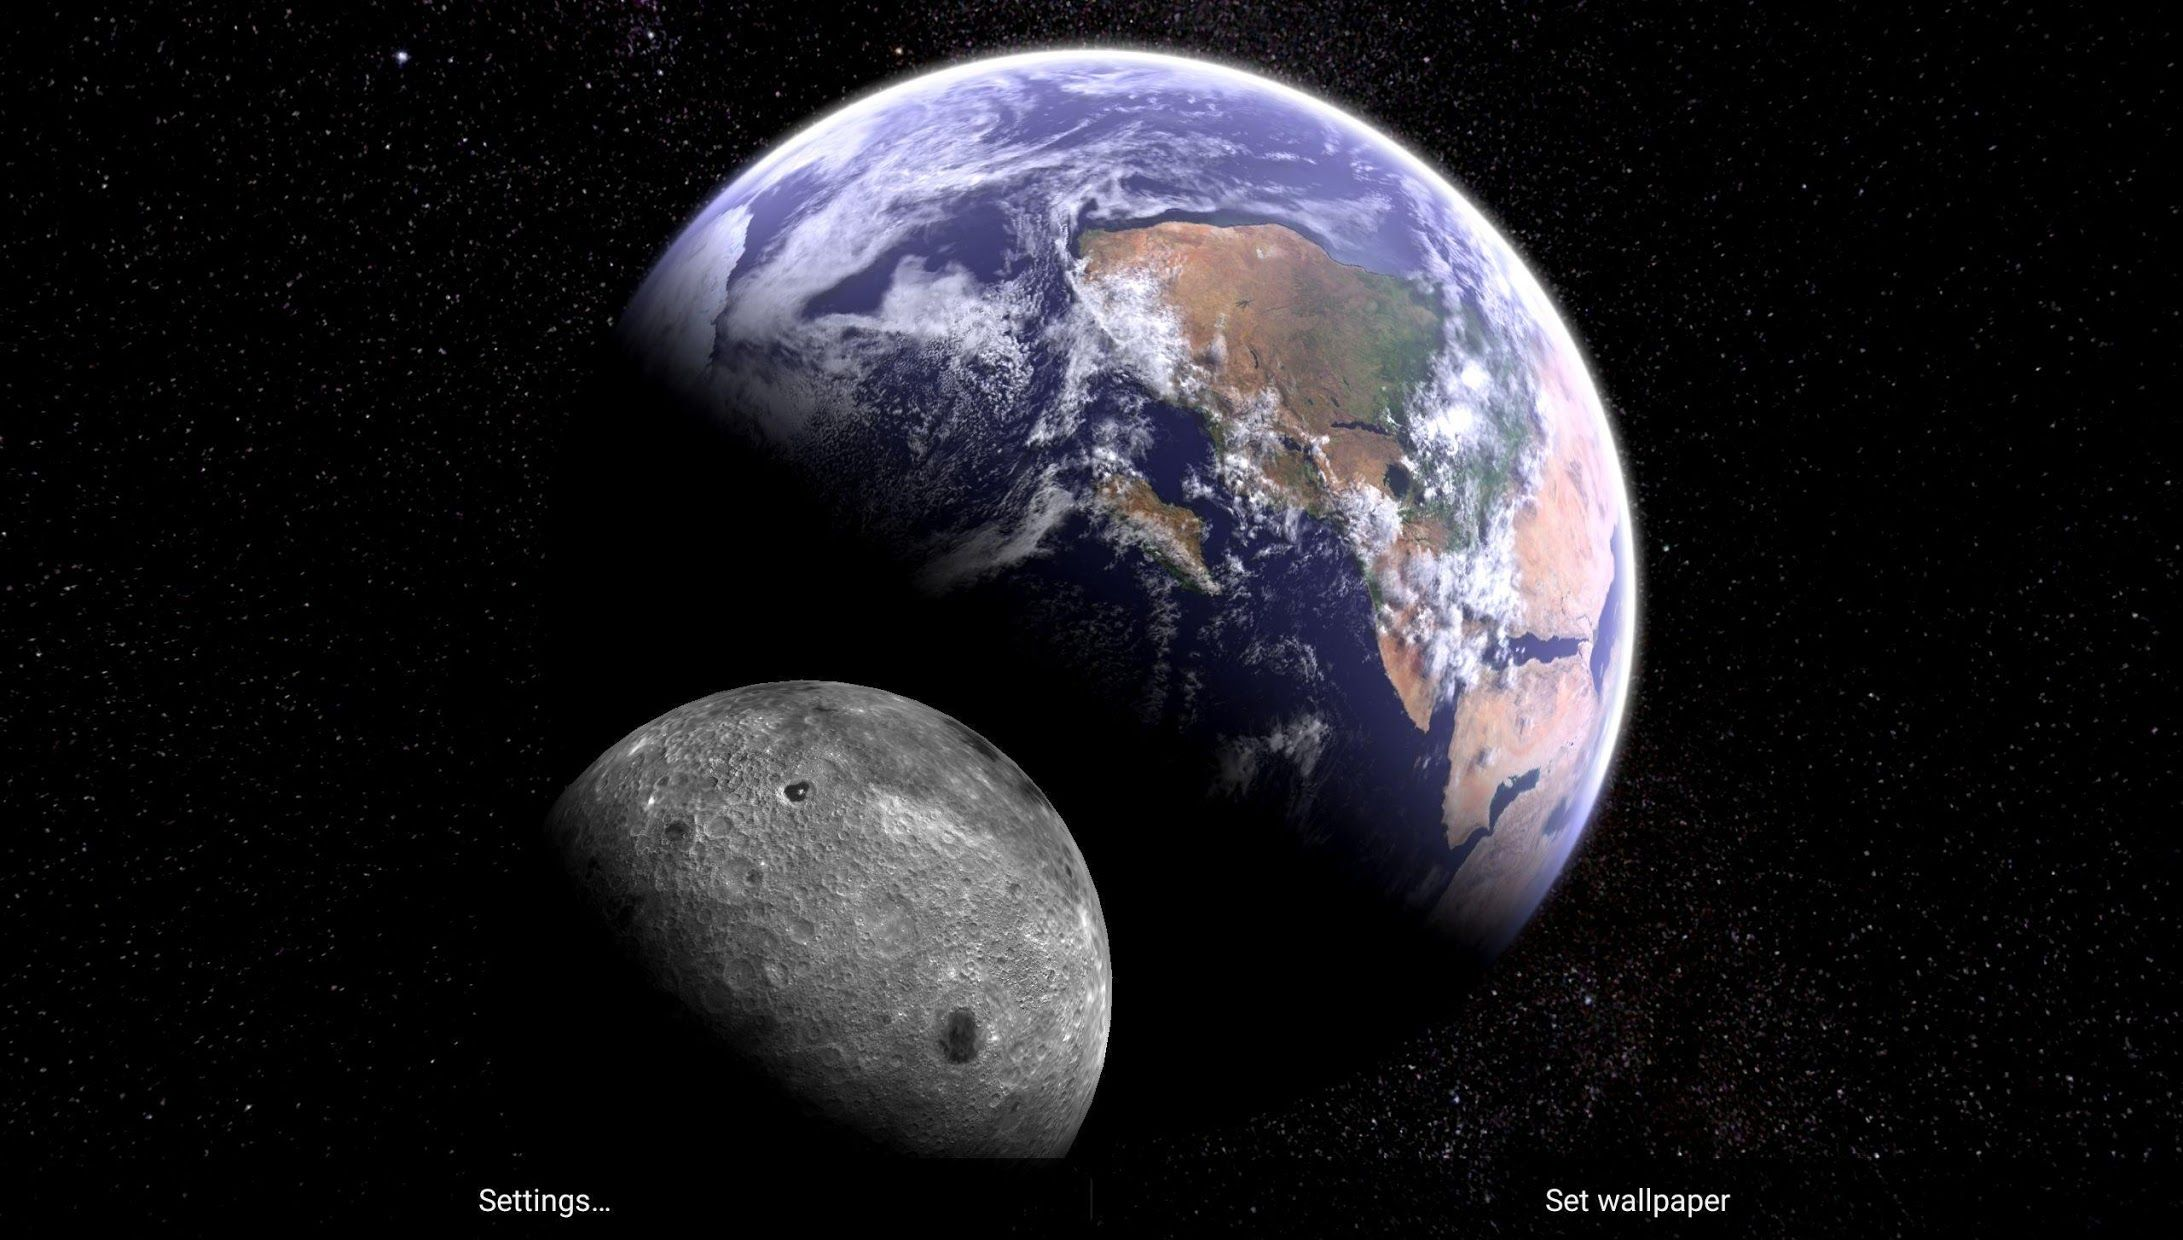 Earth & Moon in HD Gyro 3D Parallax Live Wallpaper 游戏截图4